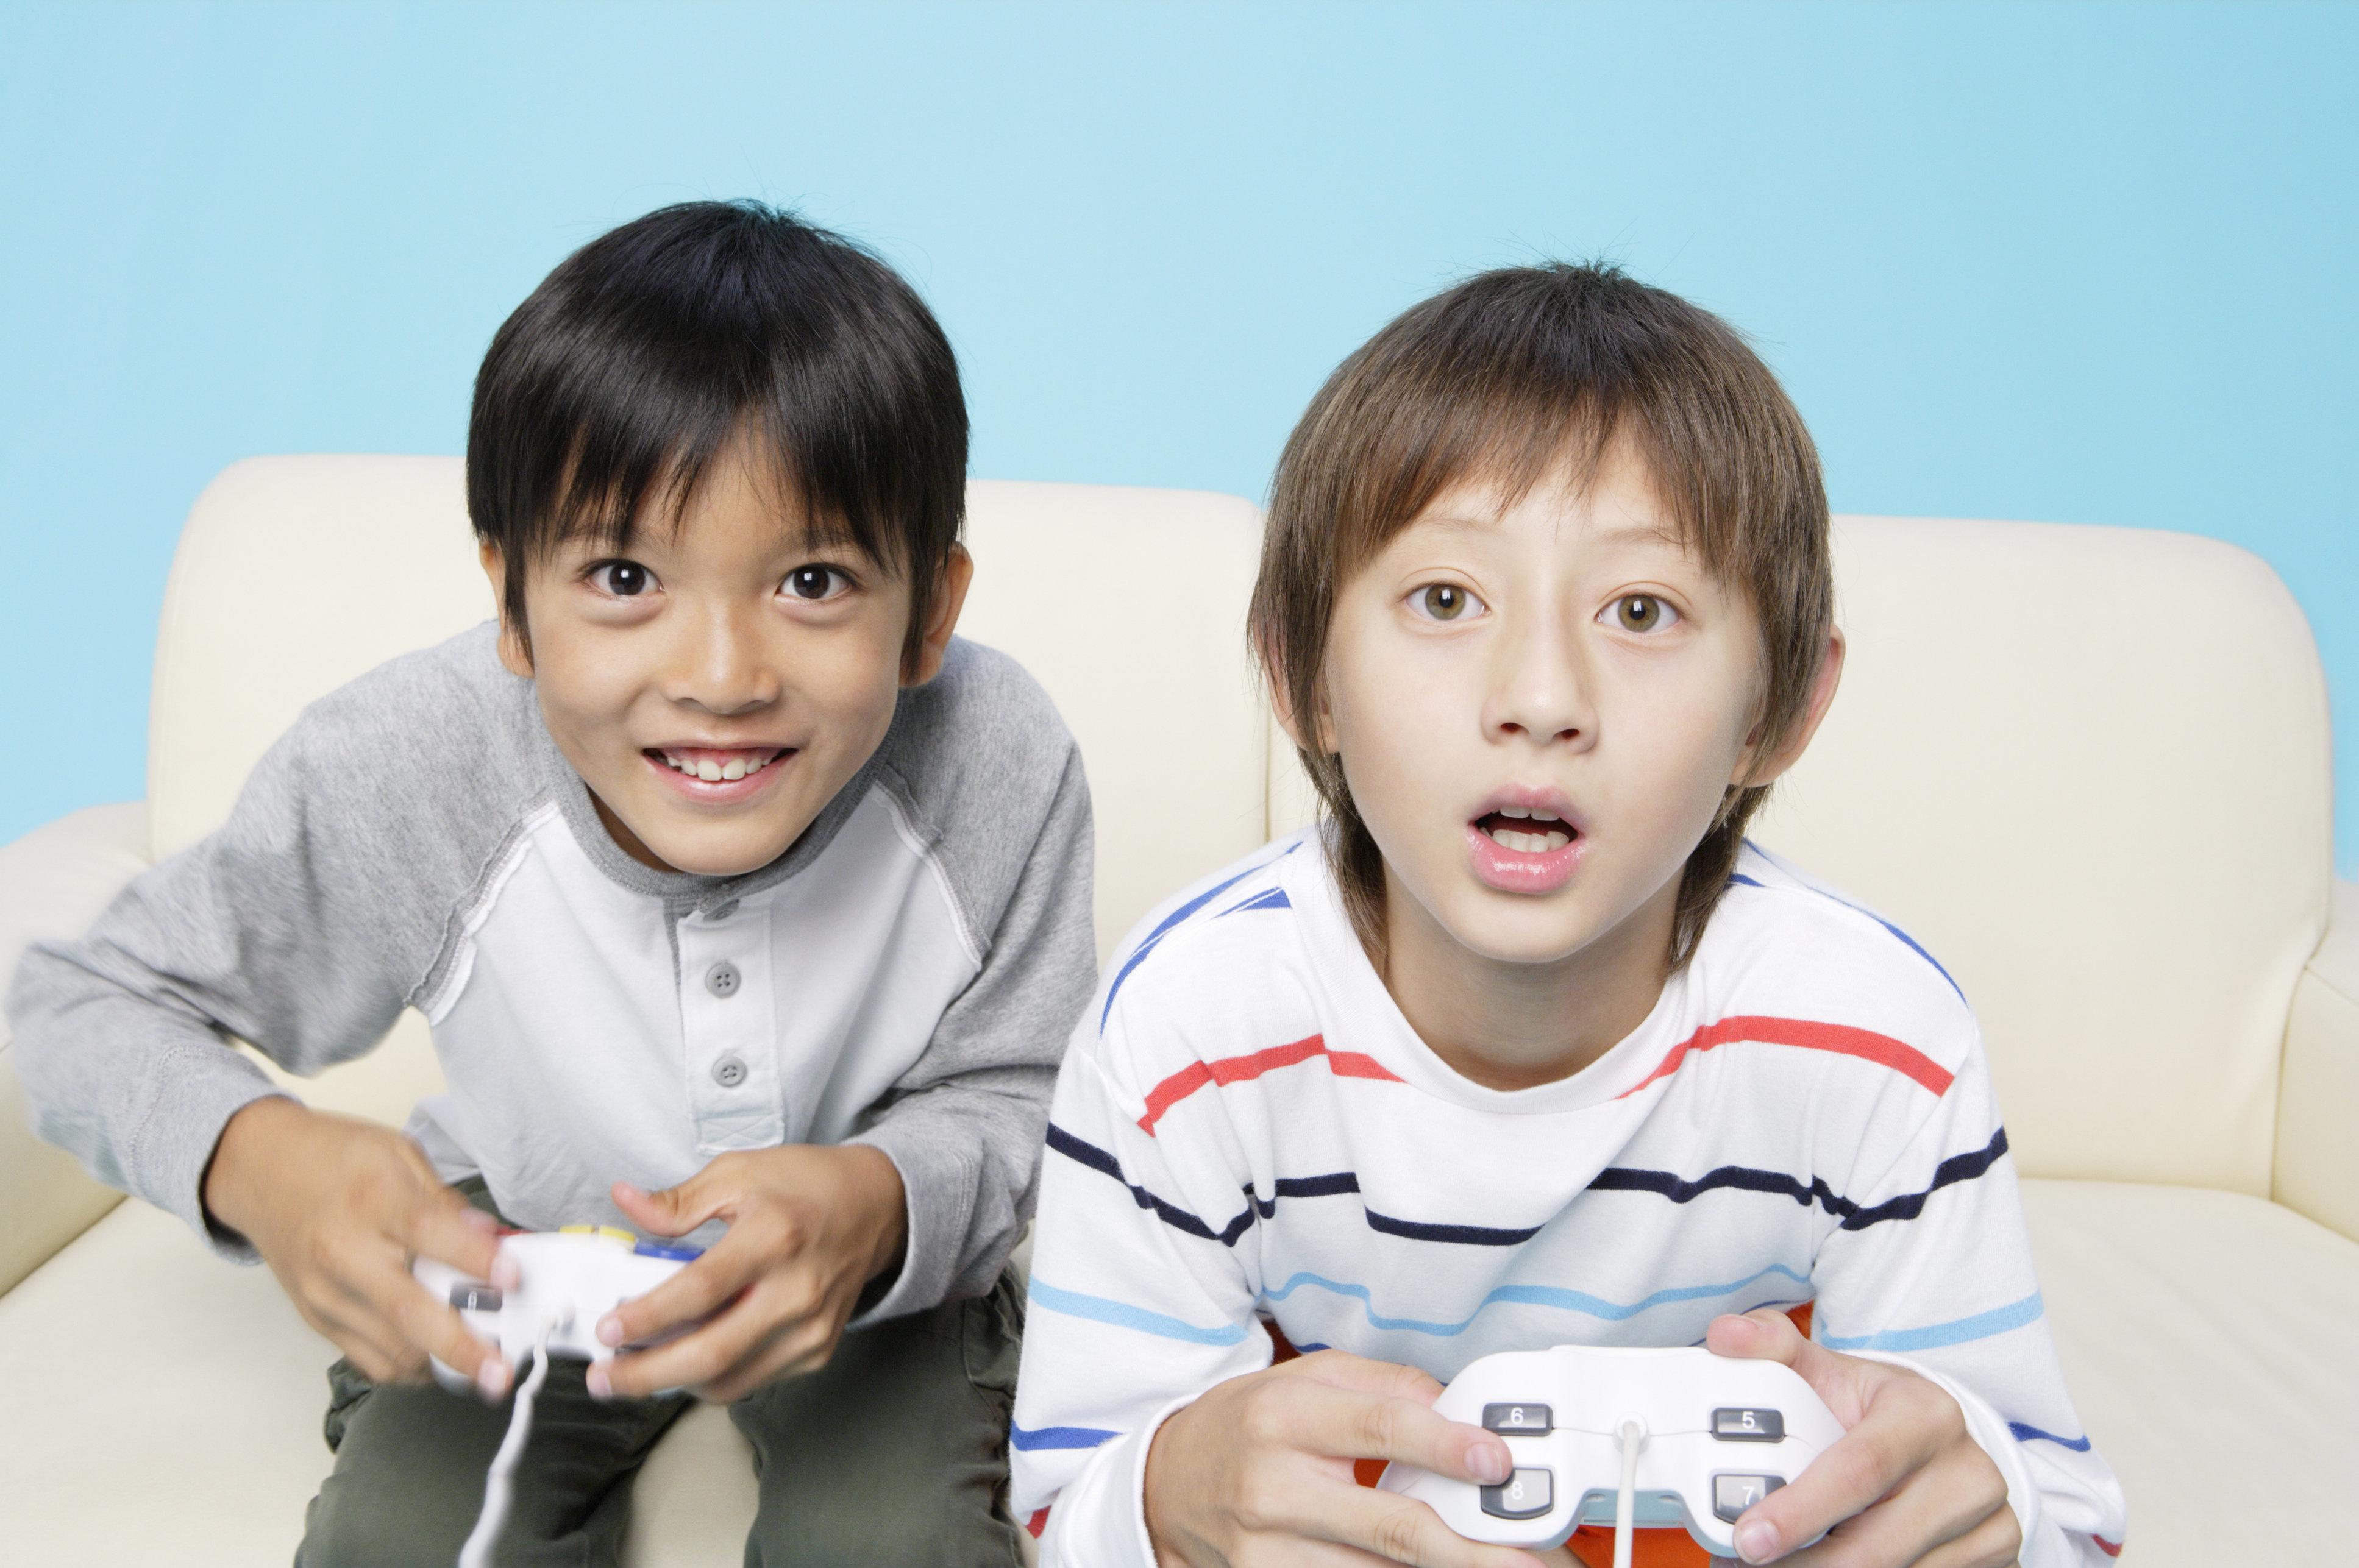 Boys playing video game, studio shot